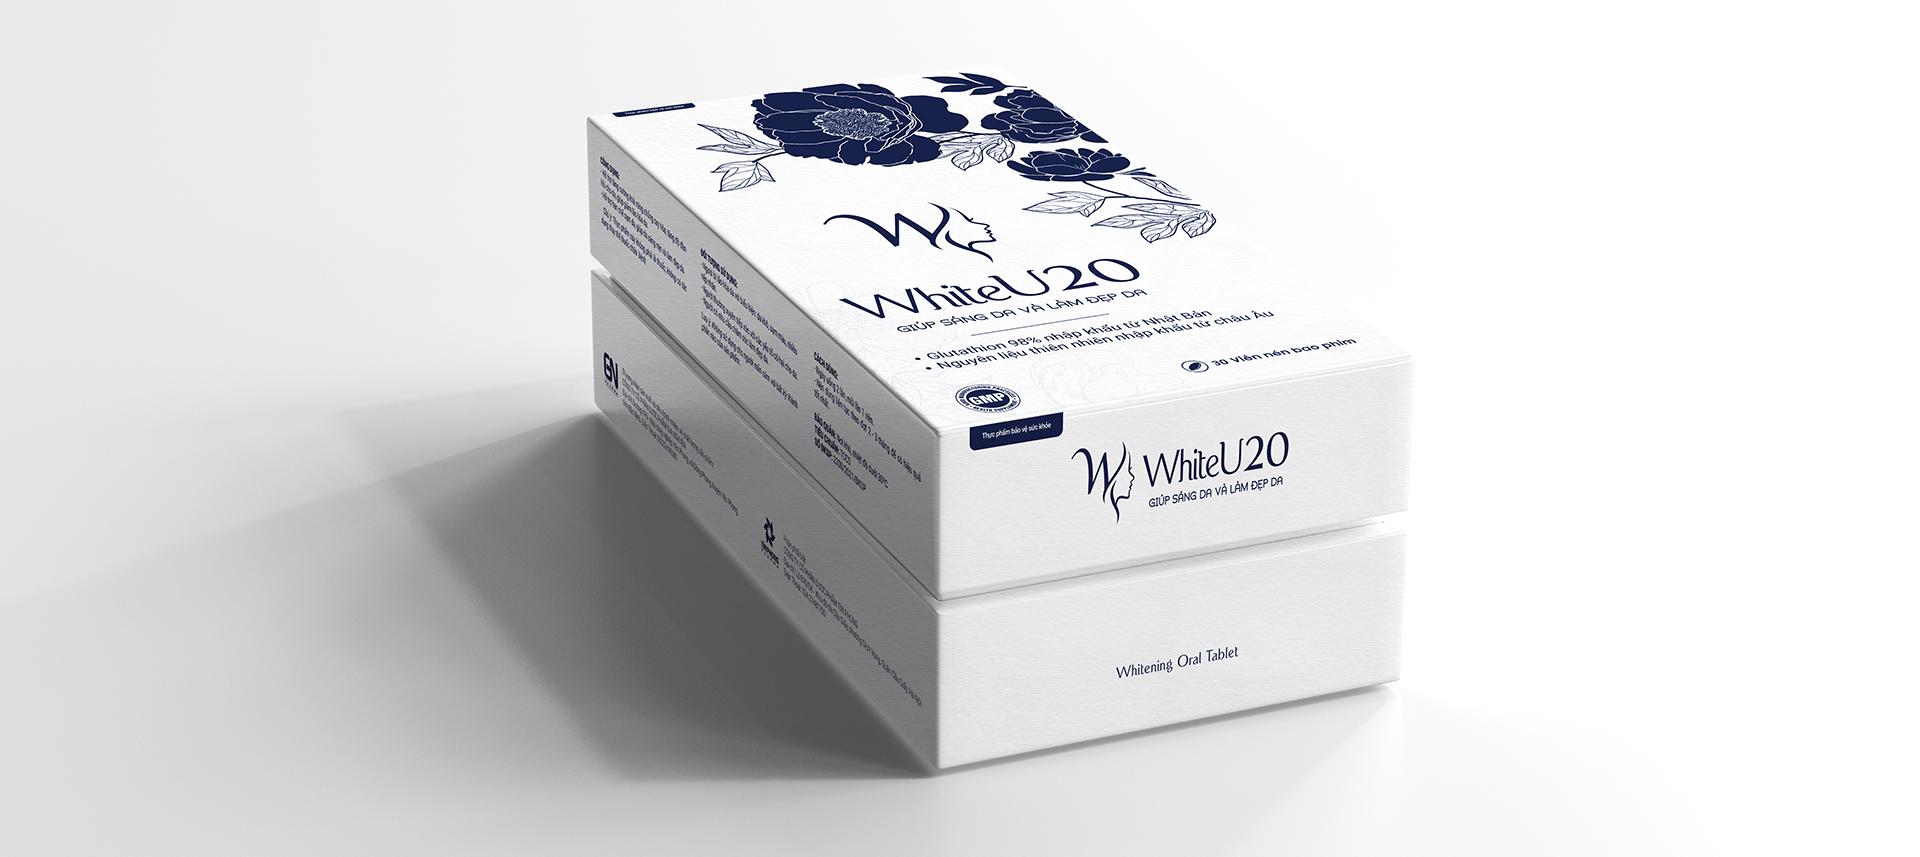 WhiteU20